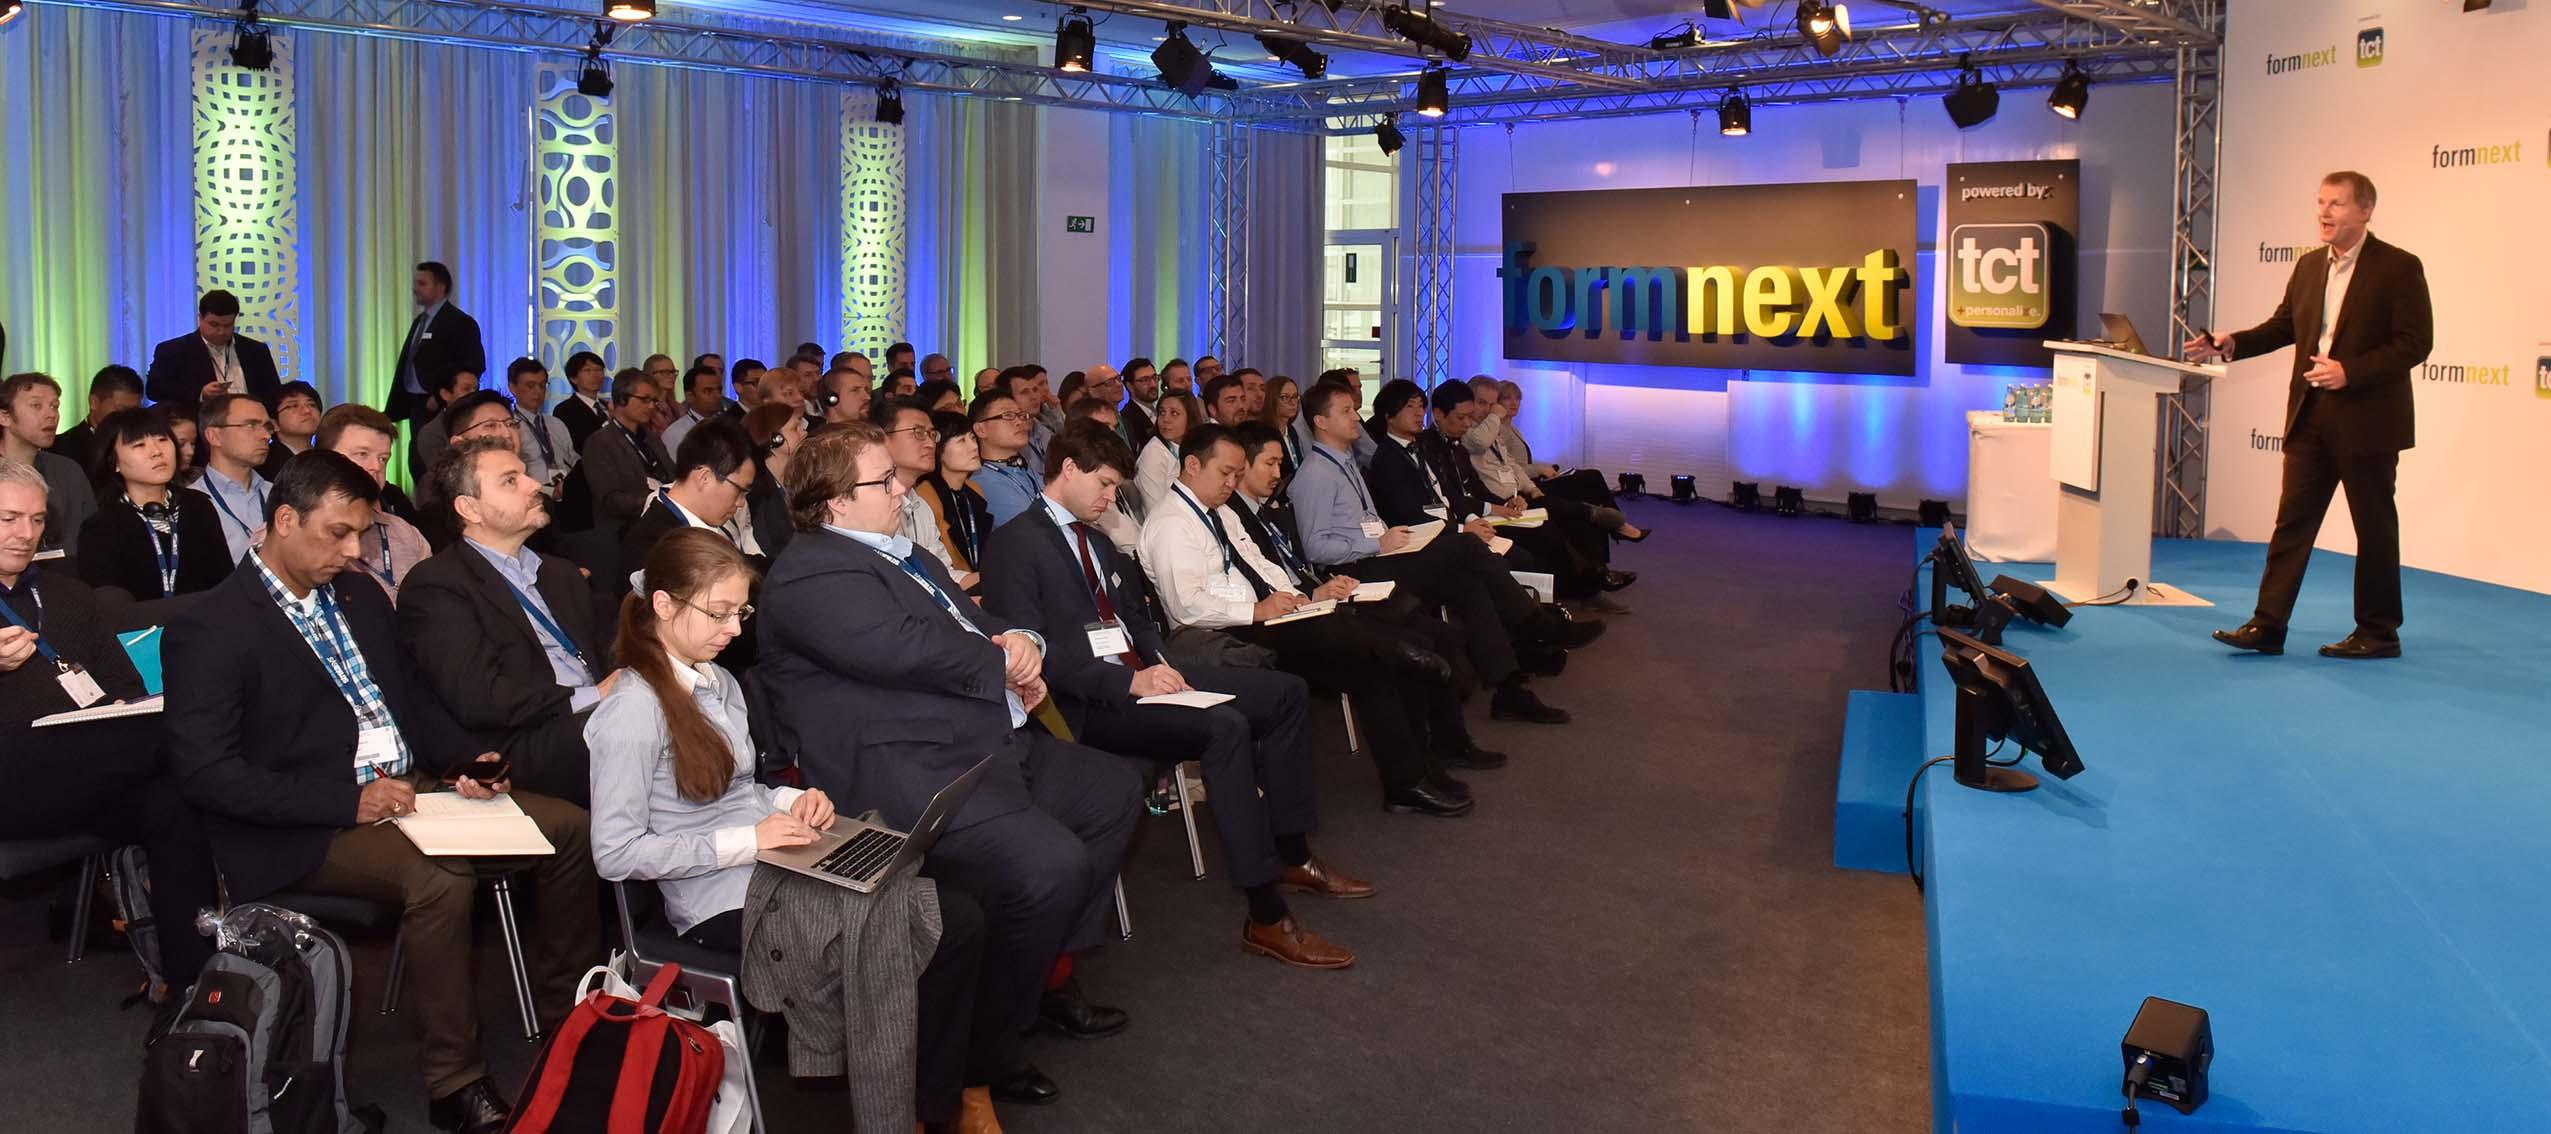 ADDIMAT vuelve a la Formnext promoviendo un stand colectivo con empresas del sector